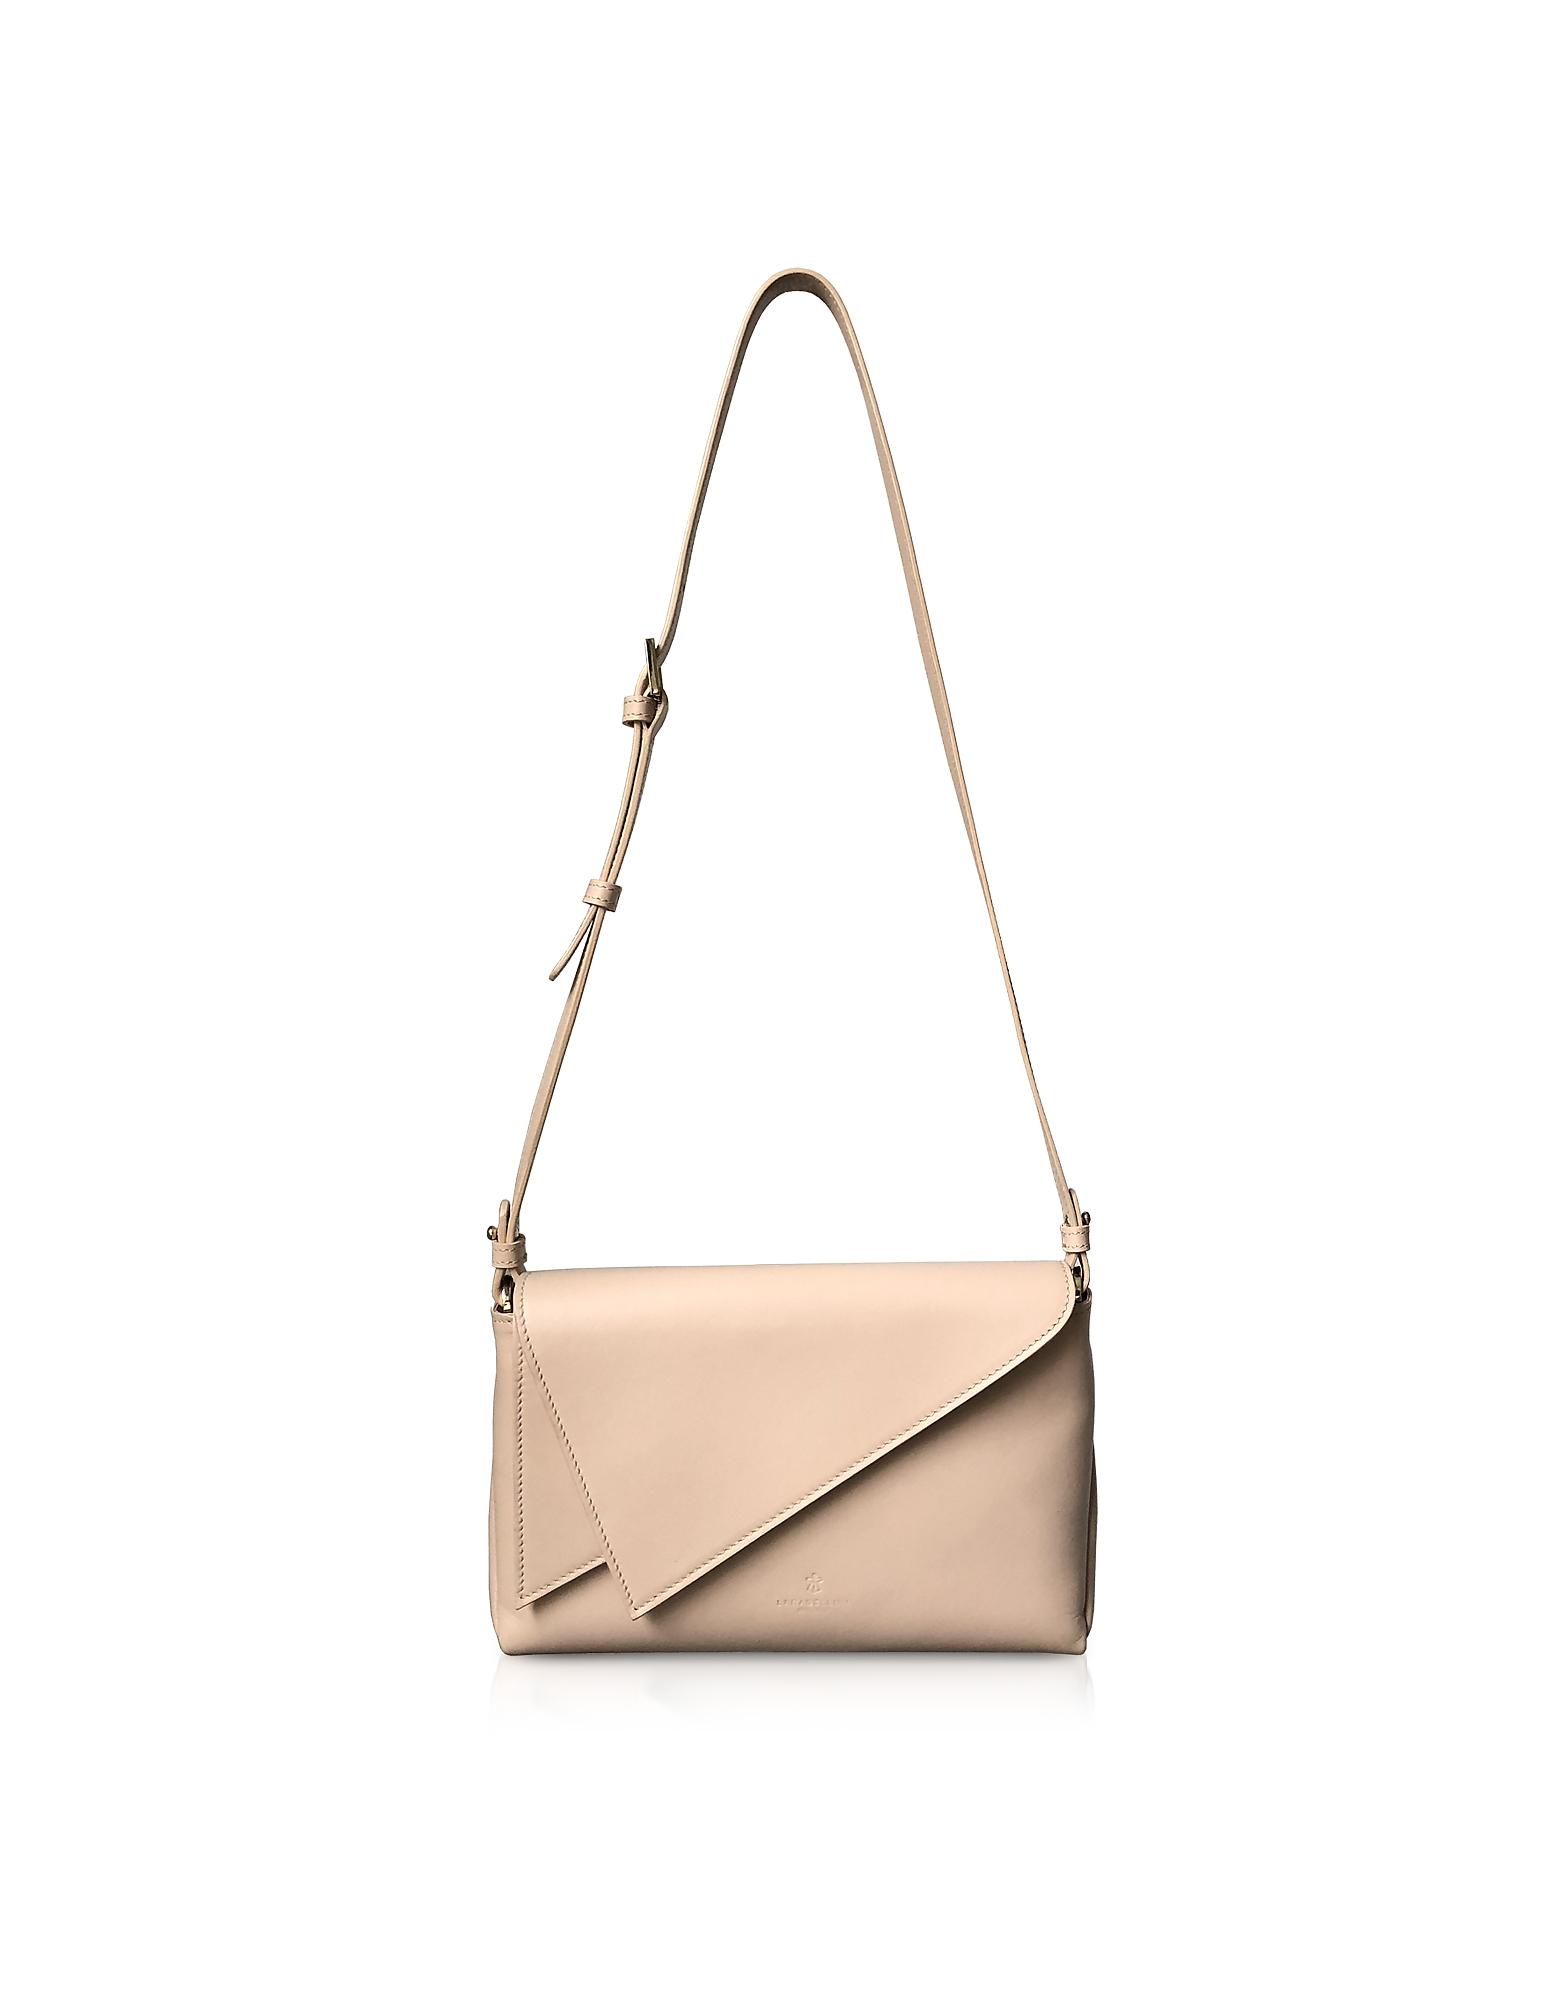 Lara Bellini Designer Handbags, Pink Leather Flip Mini Shoulder Bag